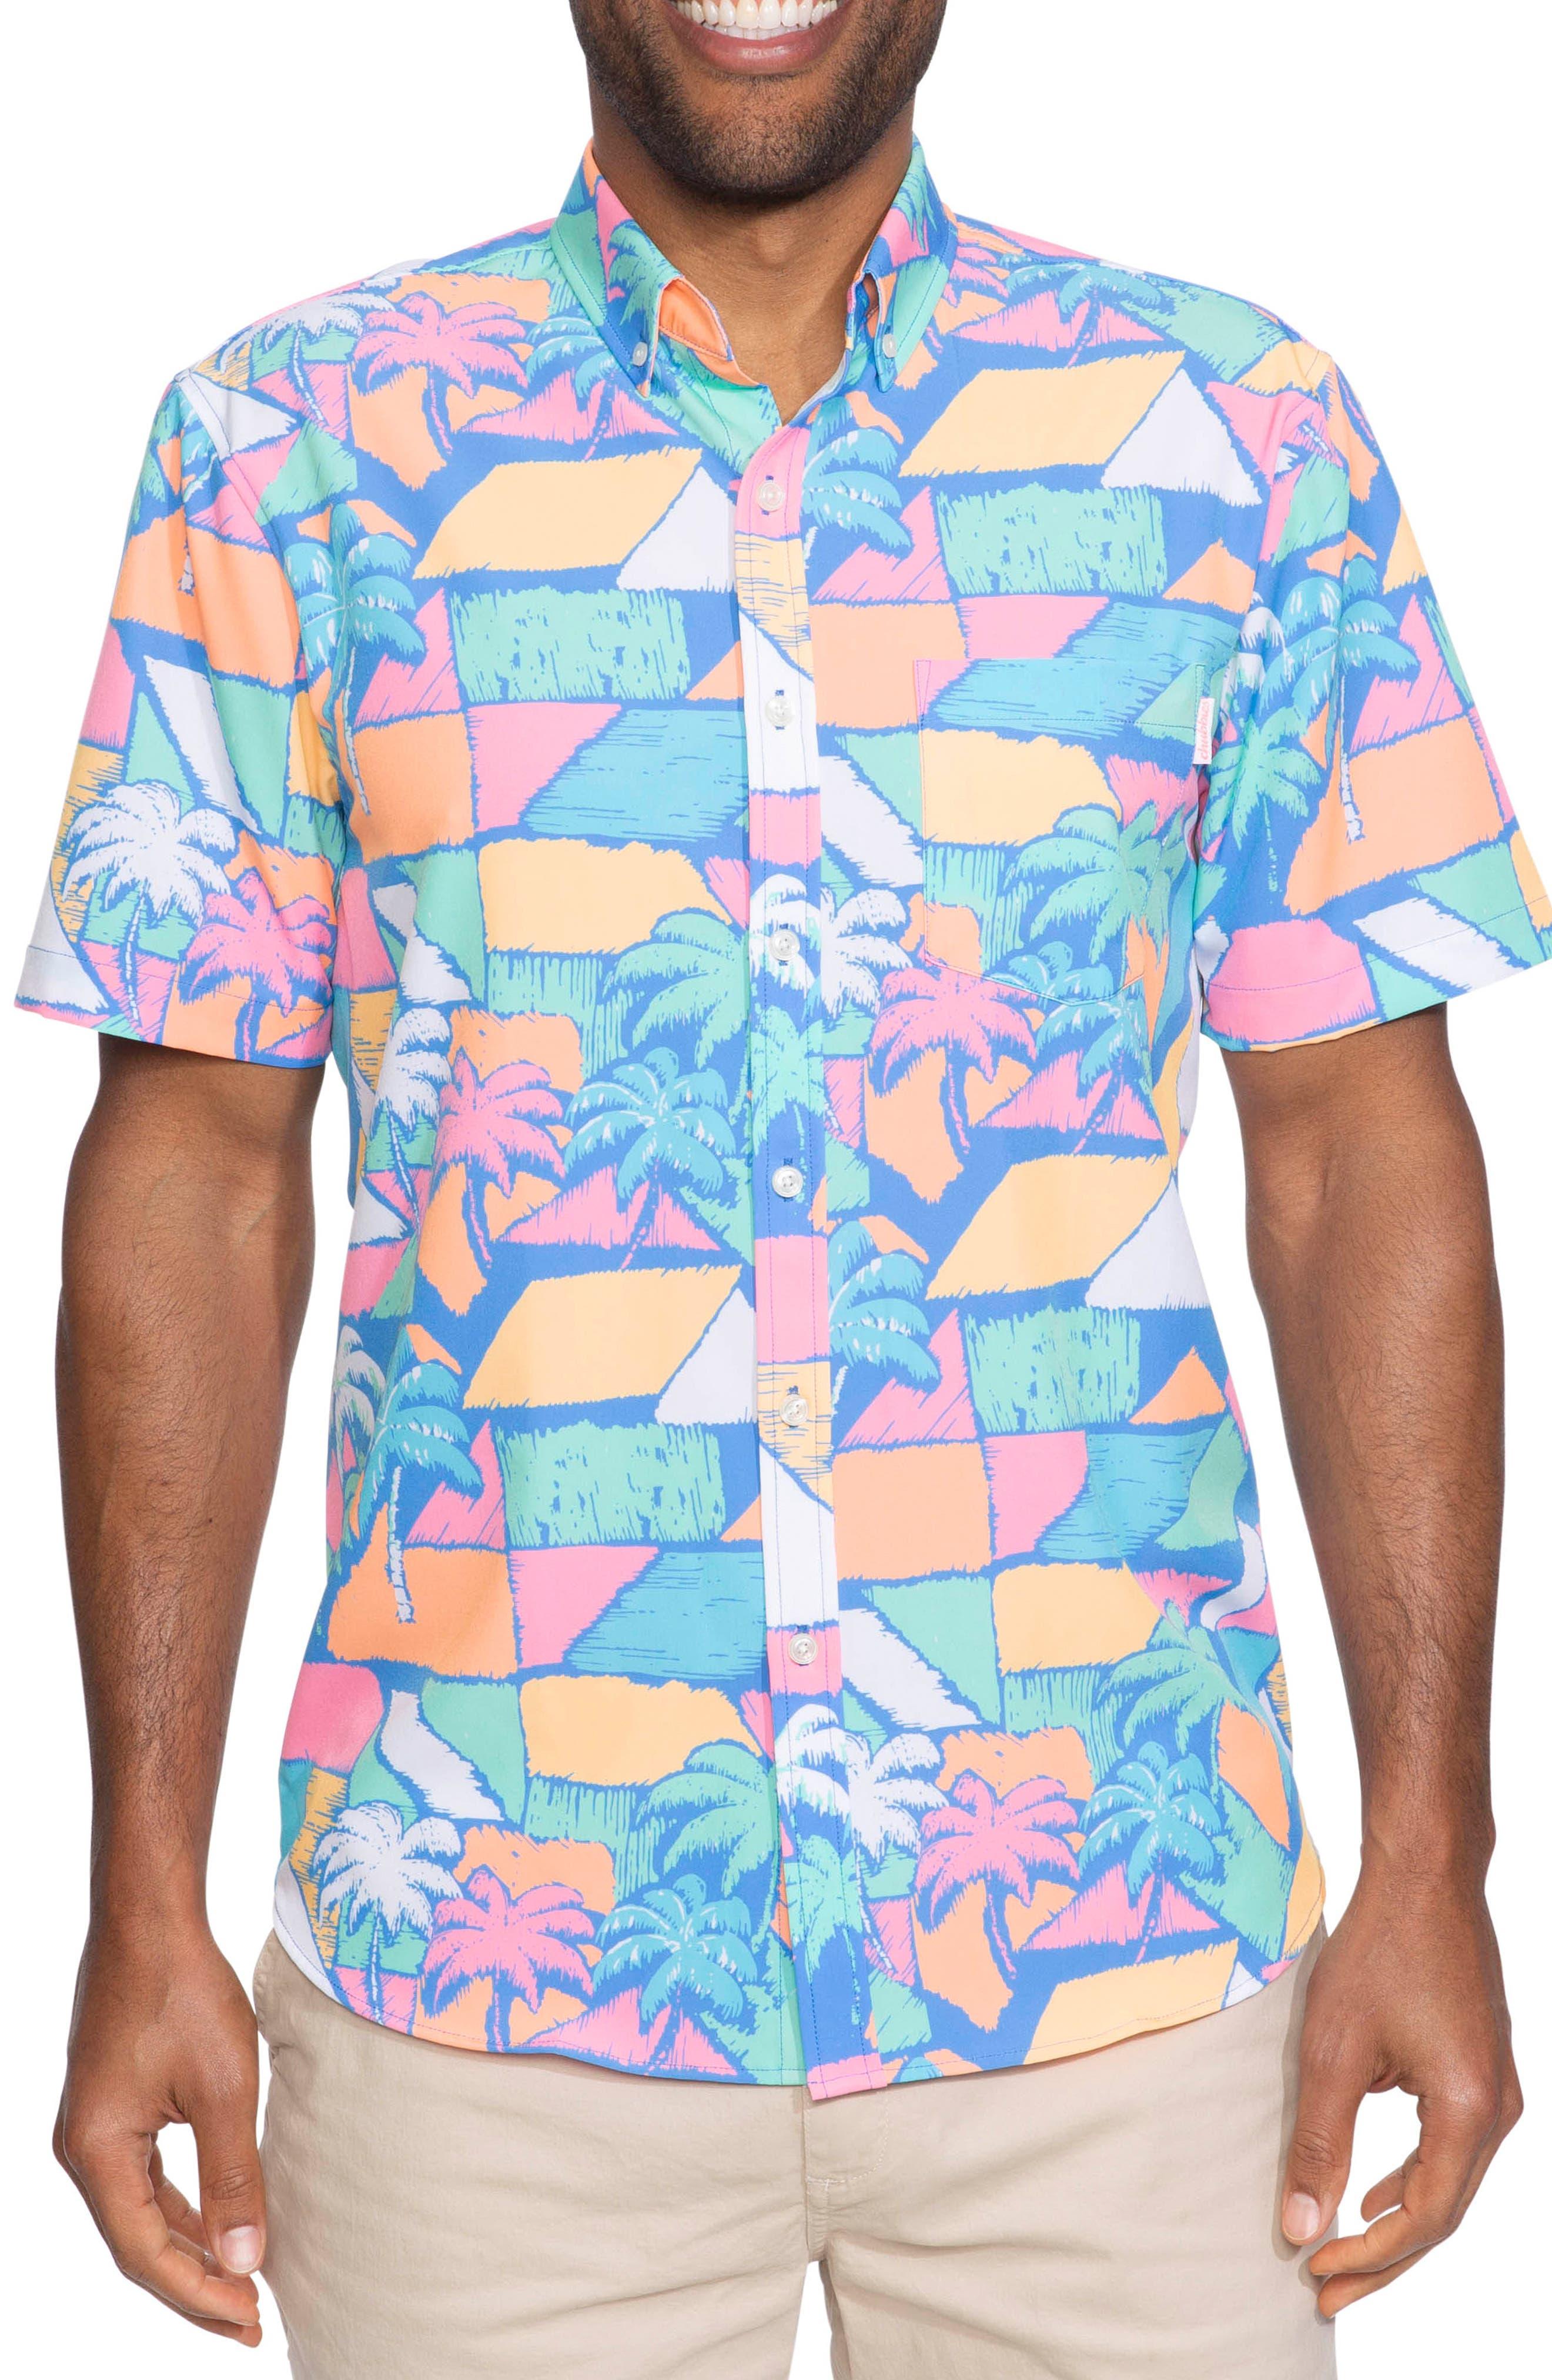 b049ebadd Buy chubbies shirts for men - Best men's chubbies shirts shop ...